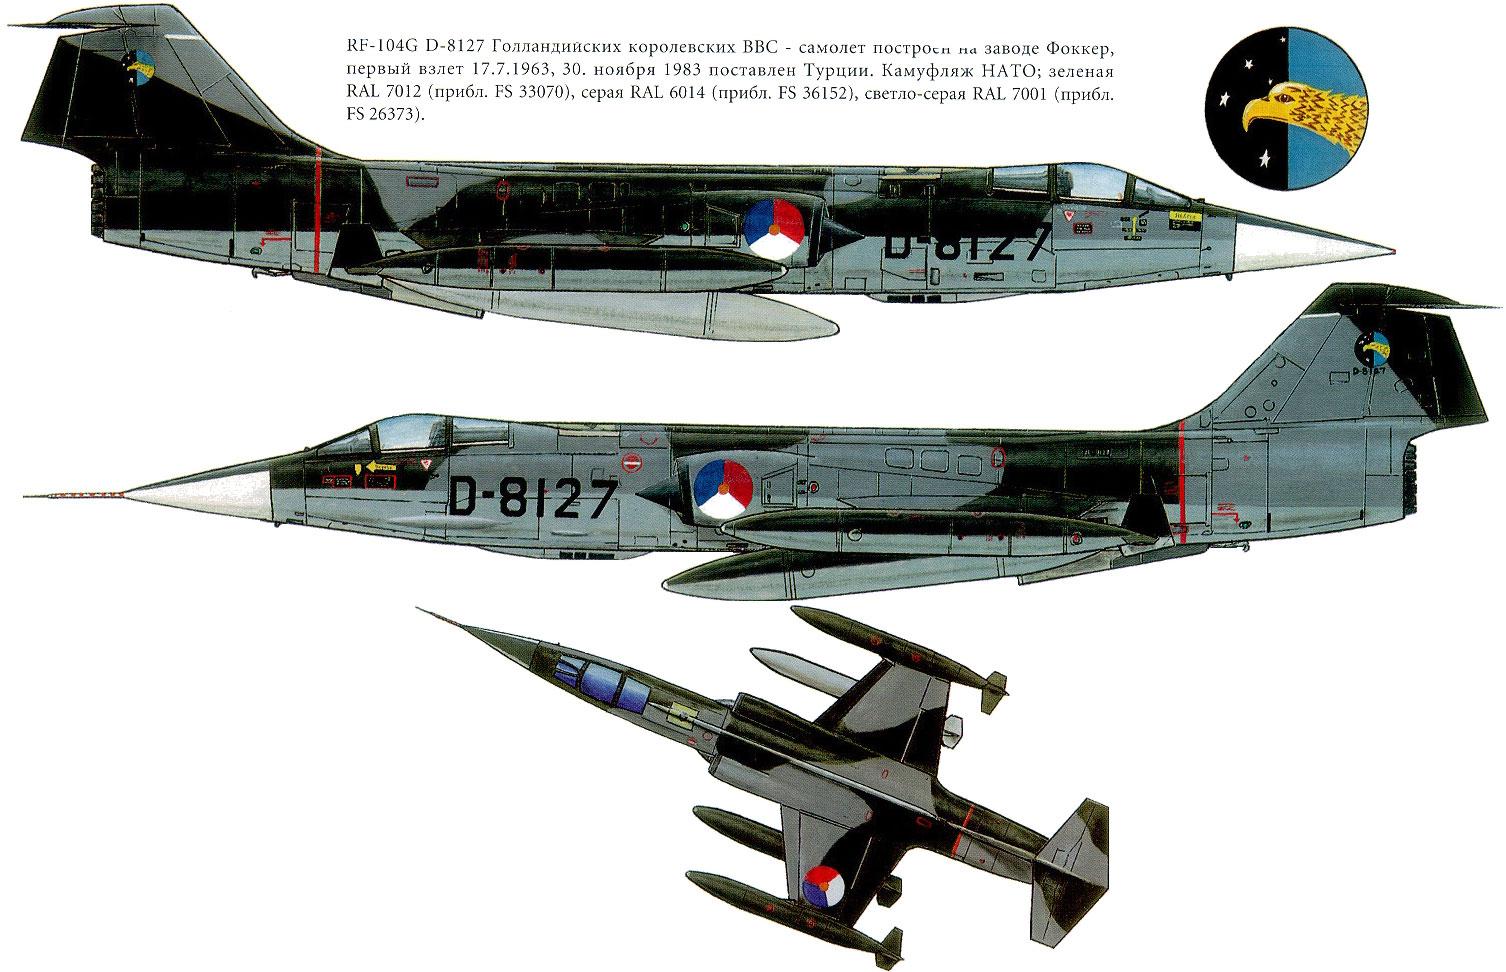 Lockheed RF-104G Starfighter